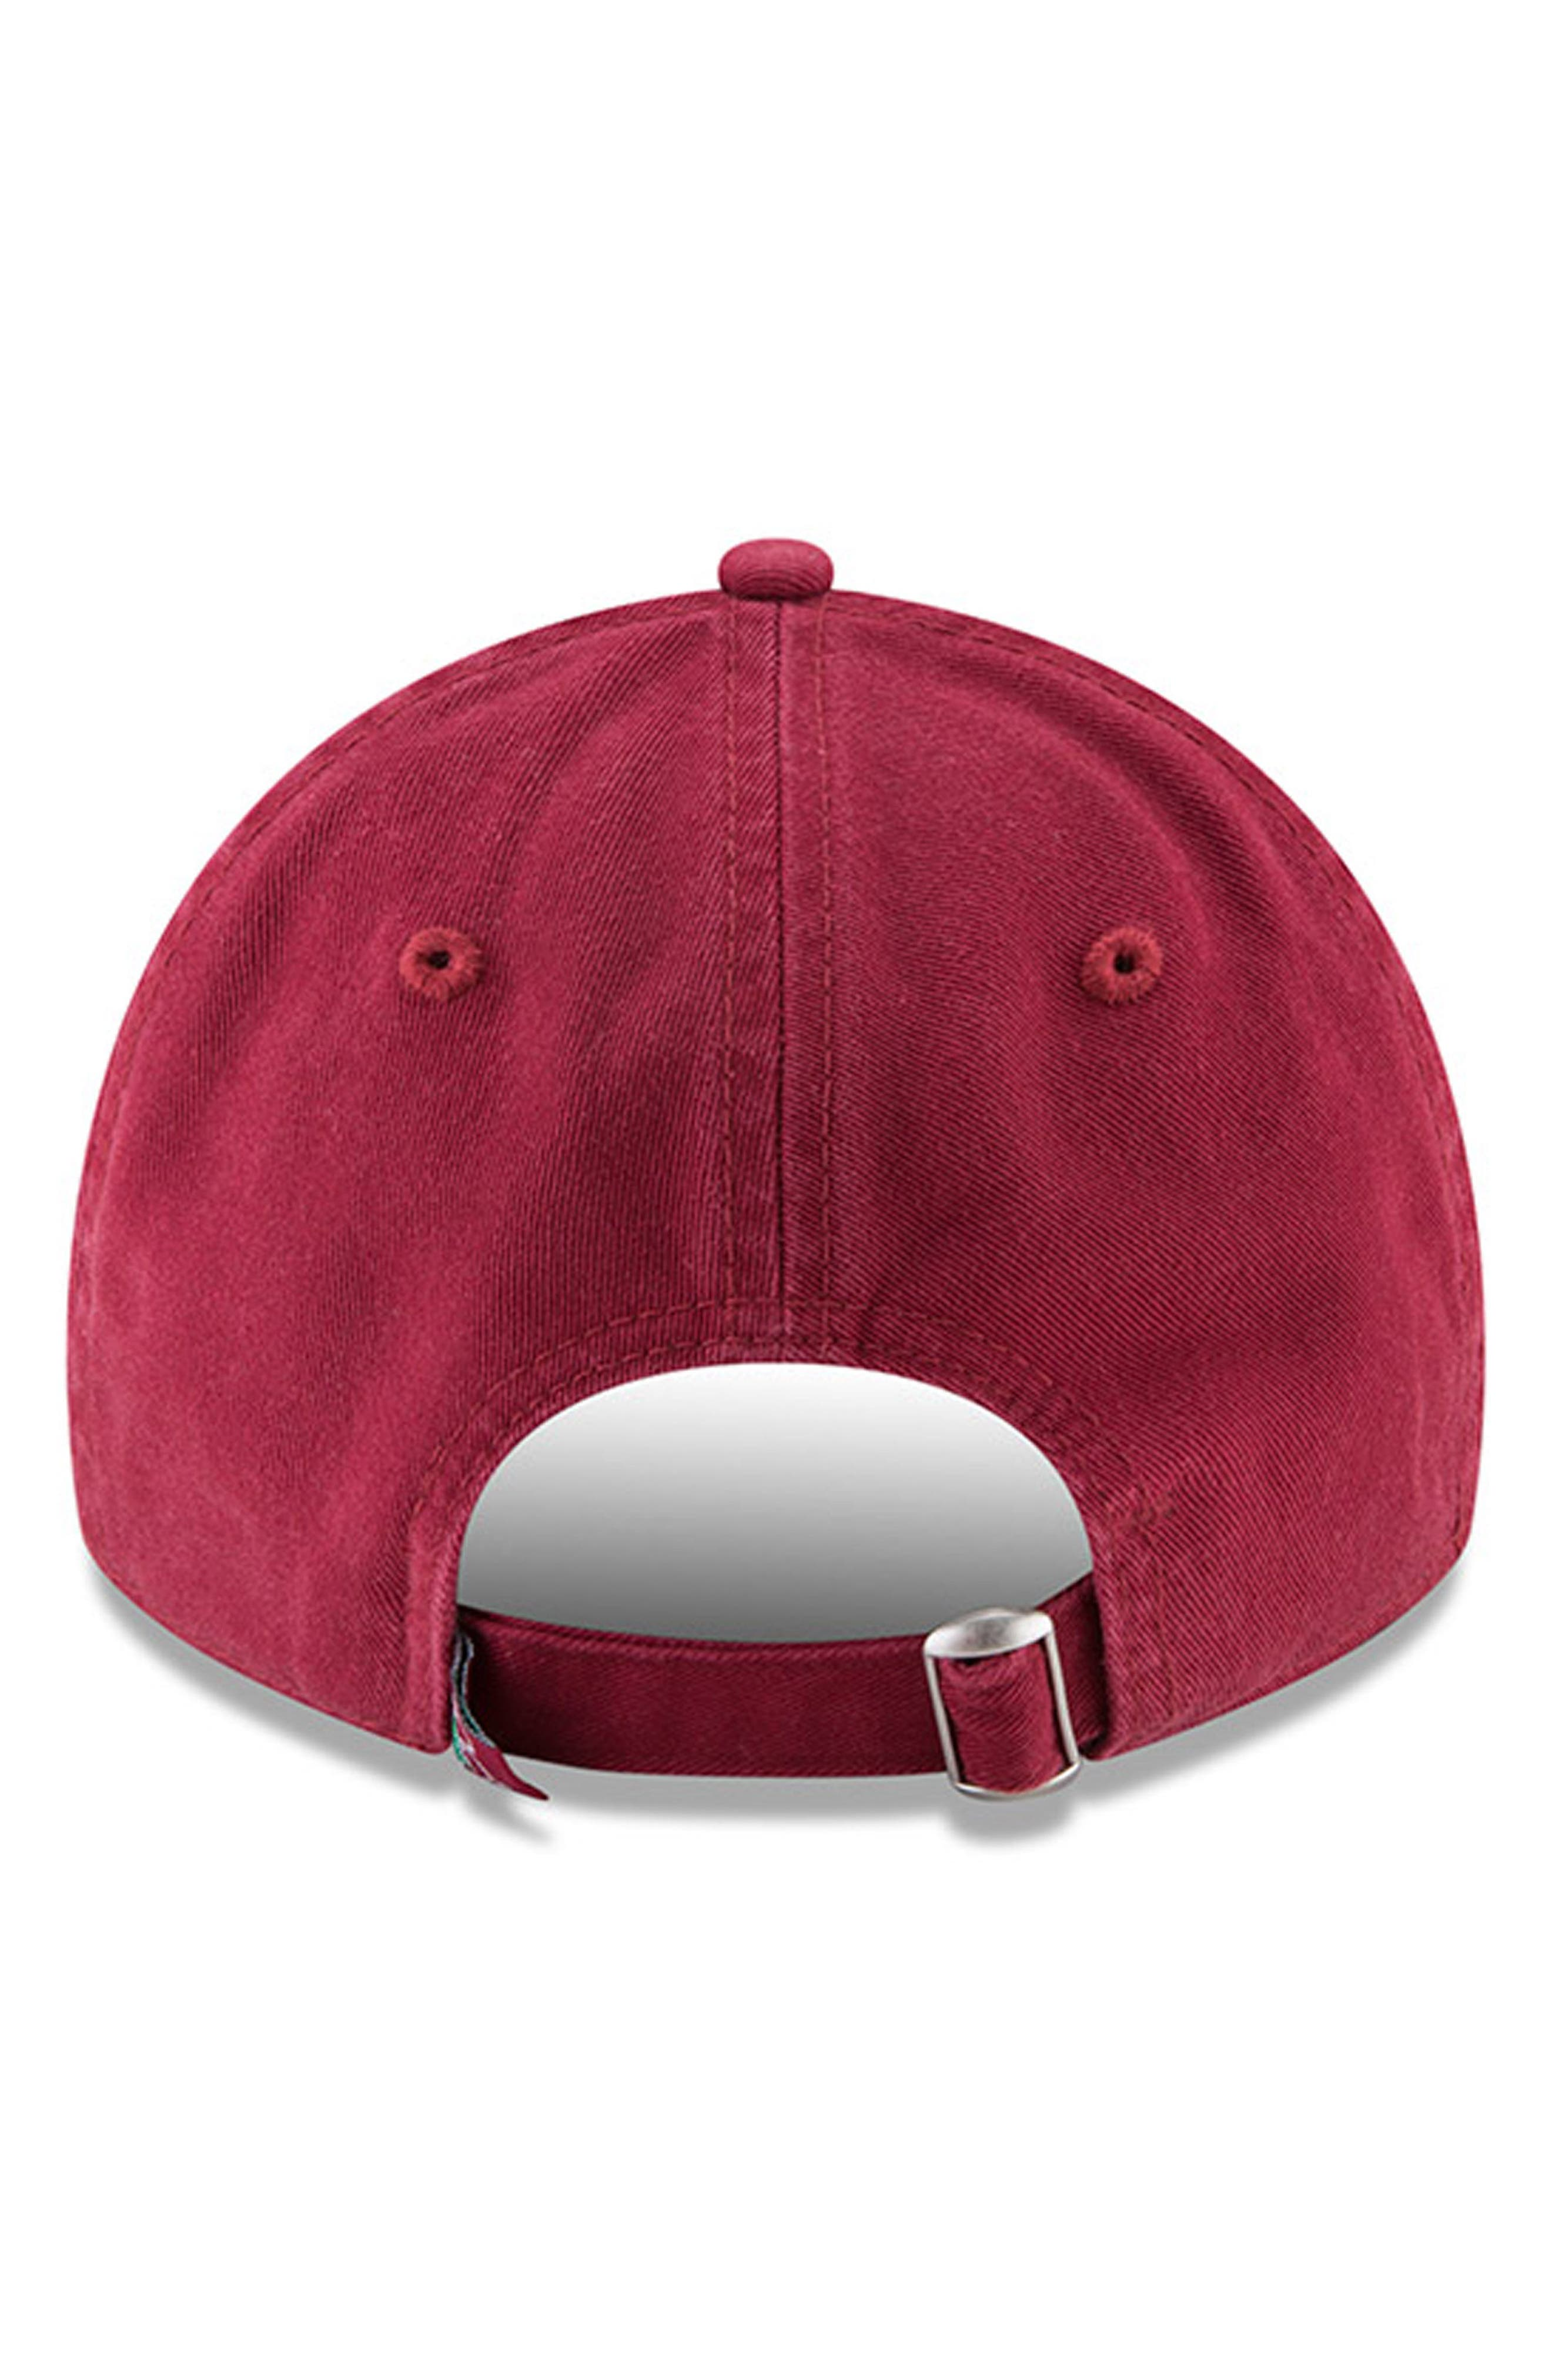 New Era Collegiate Core Classic - Stanford Cardinal Baseball Cap,                             Alternate thumbnail 3, color,                             601